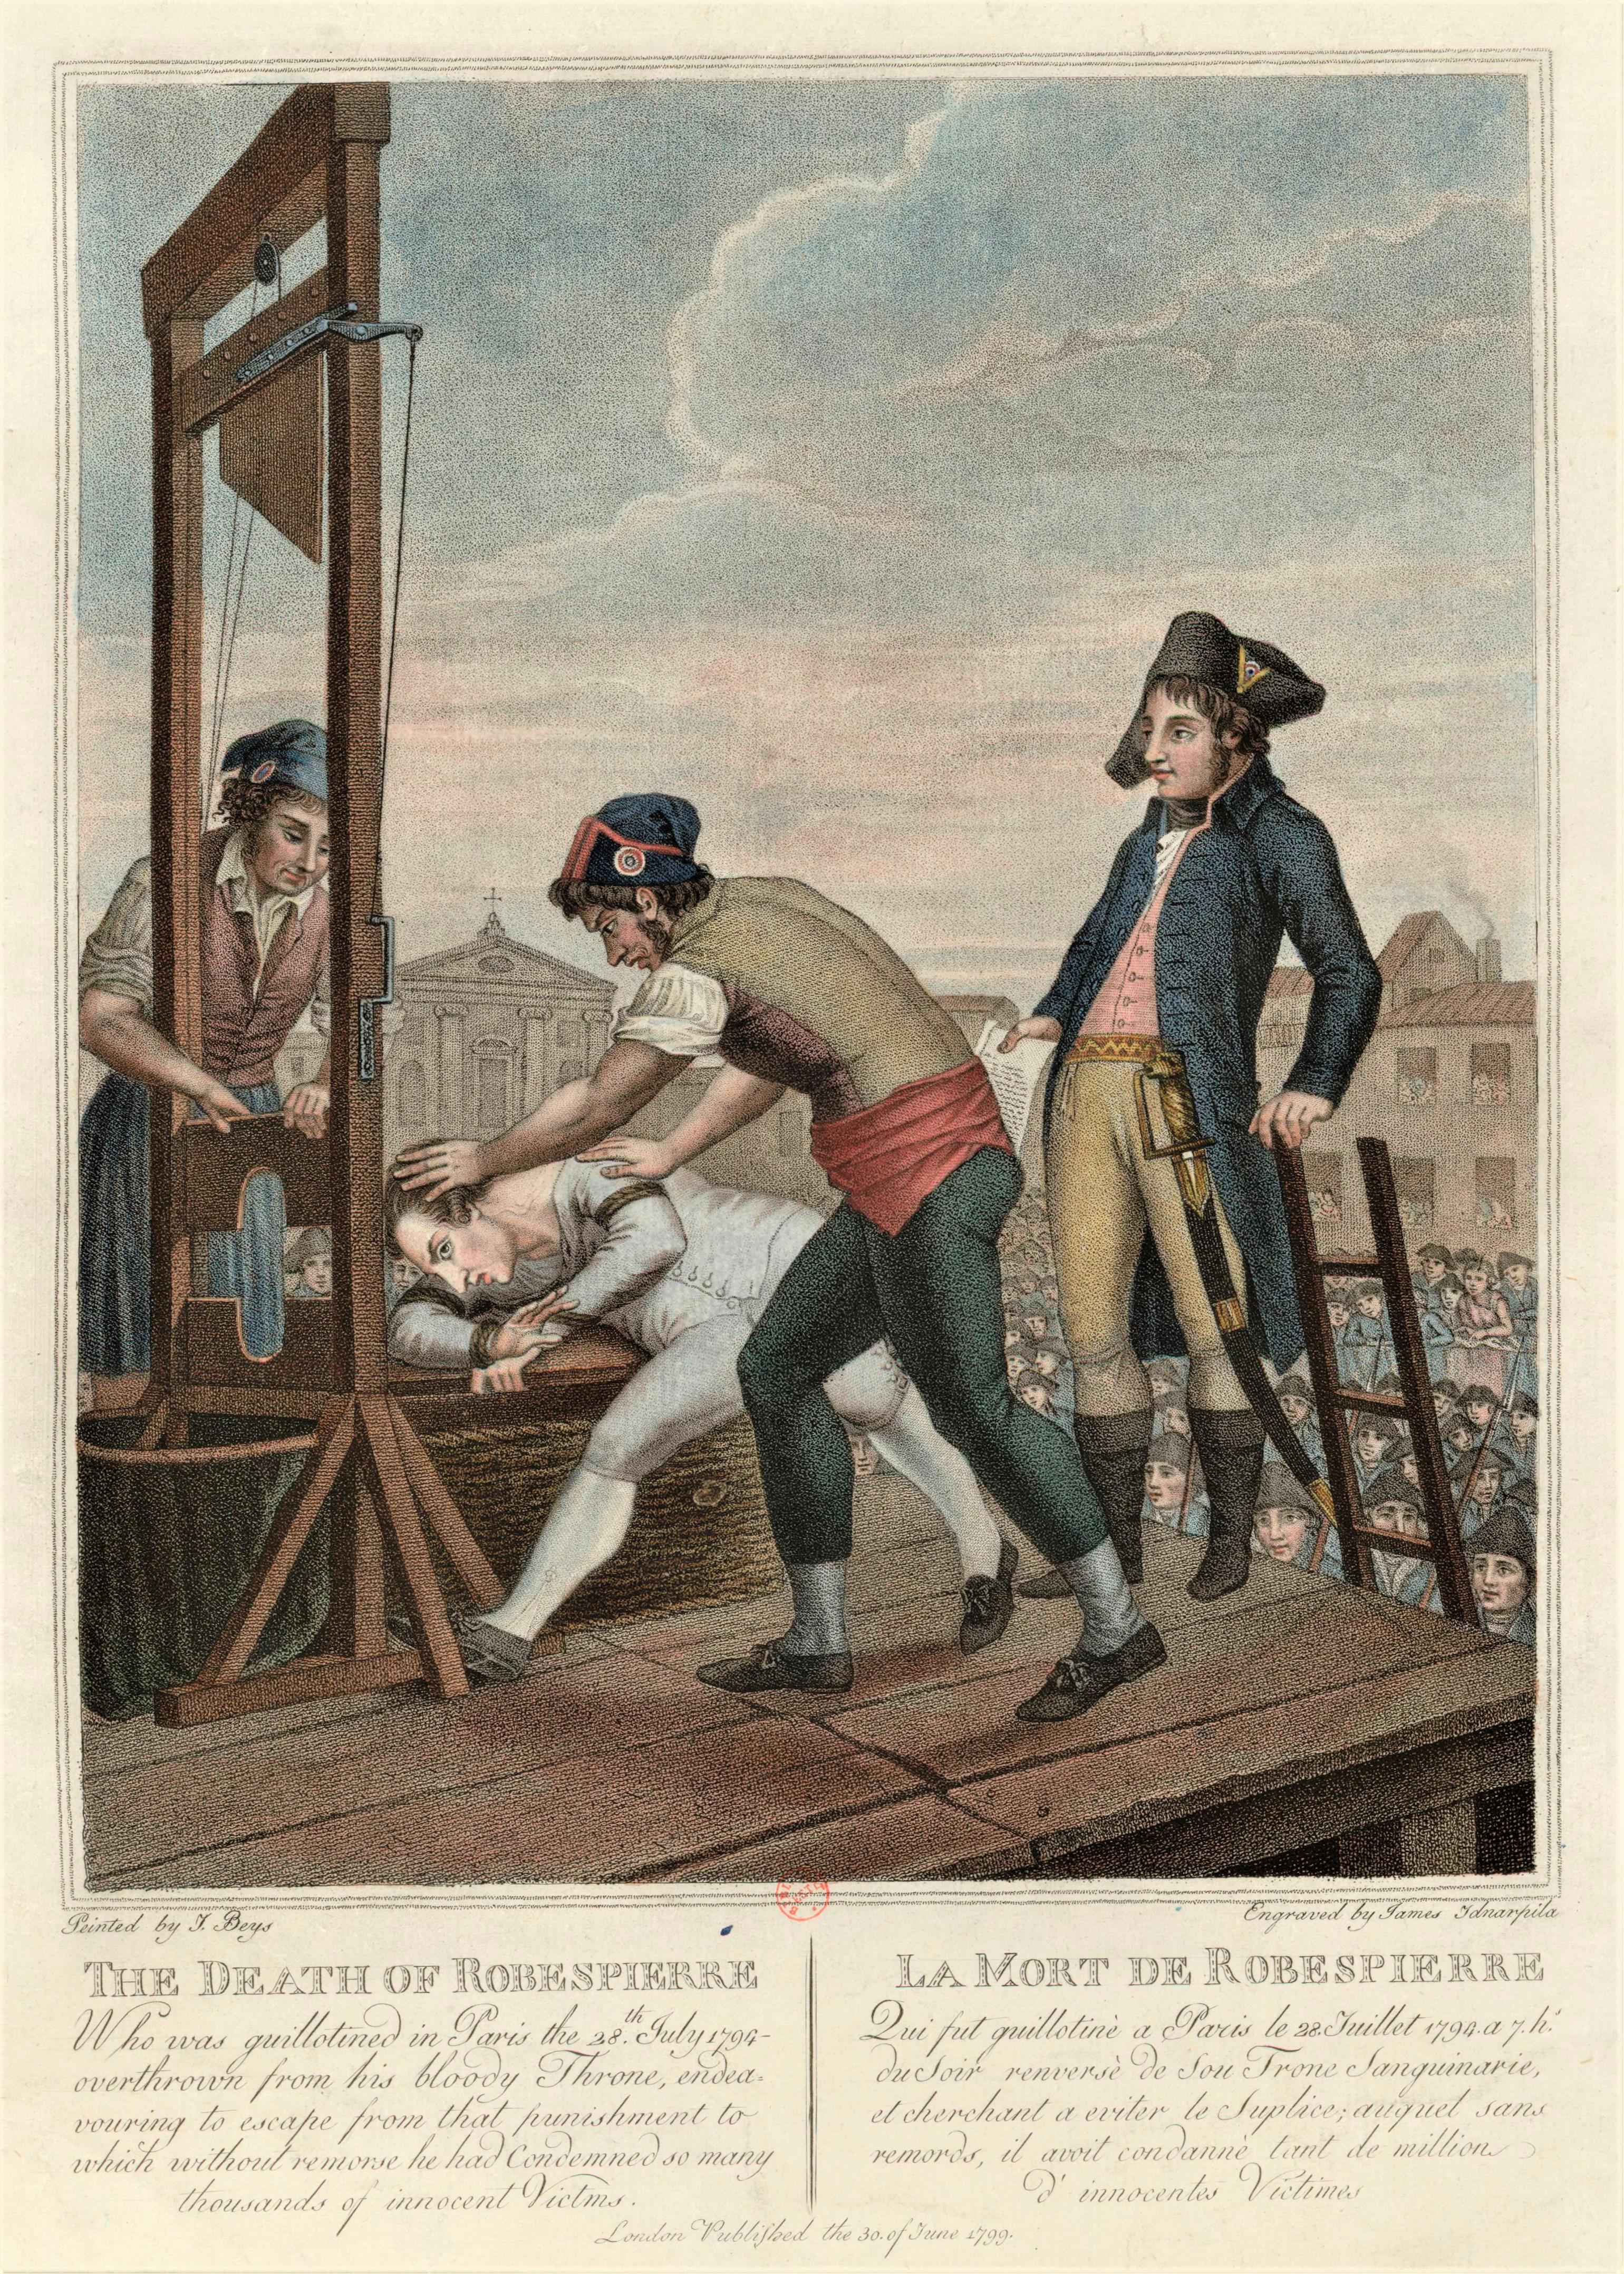 L'execution de Maximilien de Robespierre a la guillotine